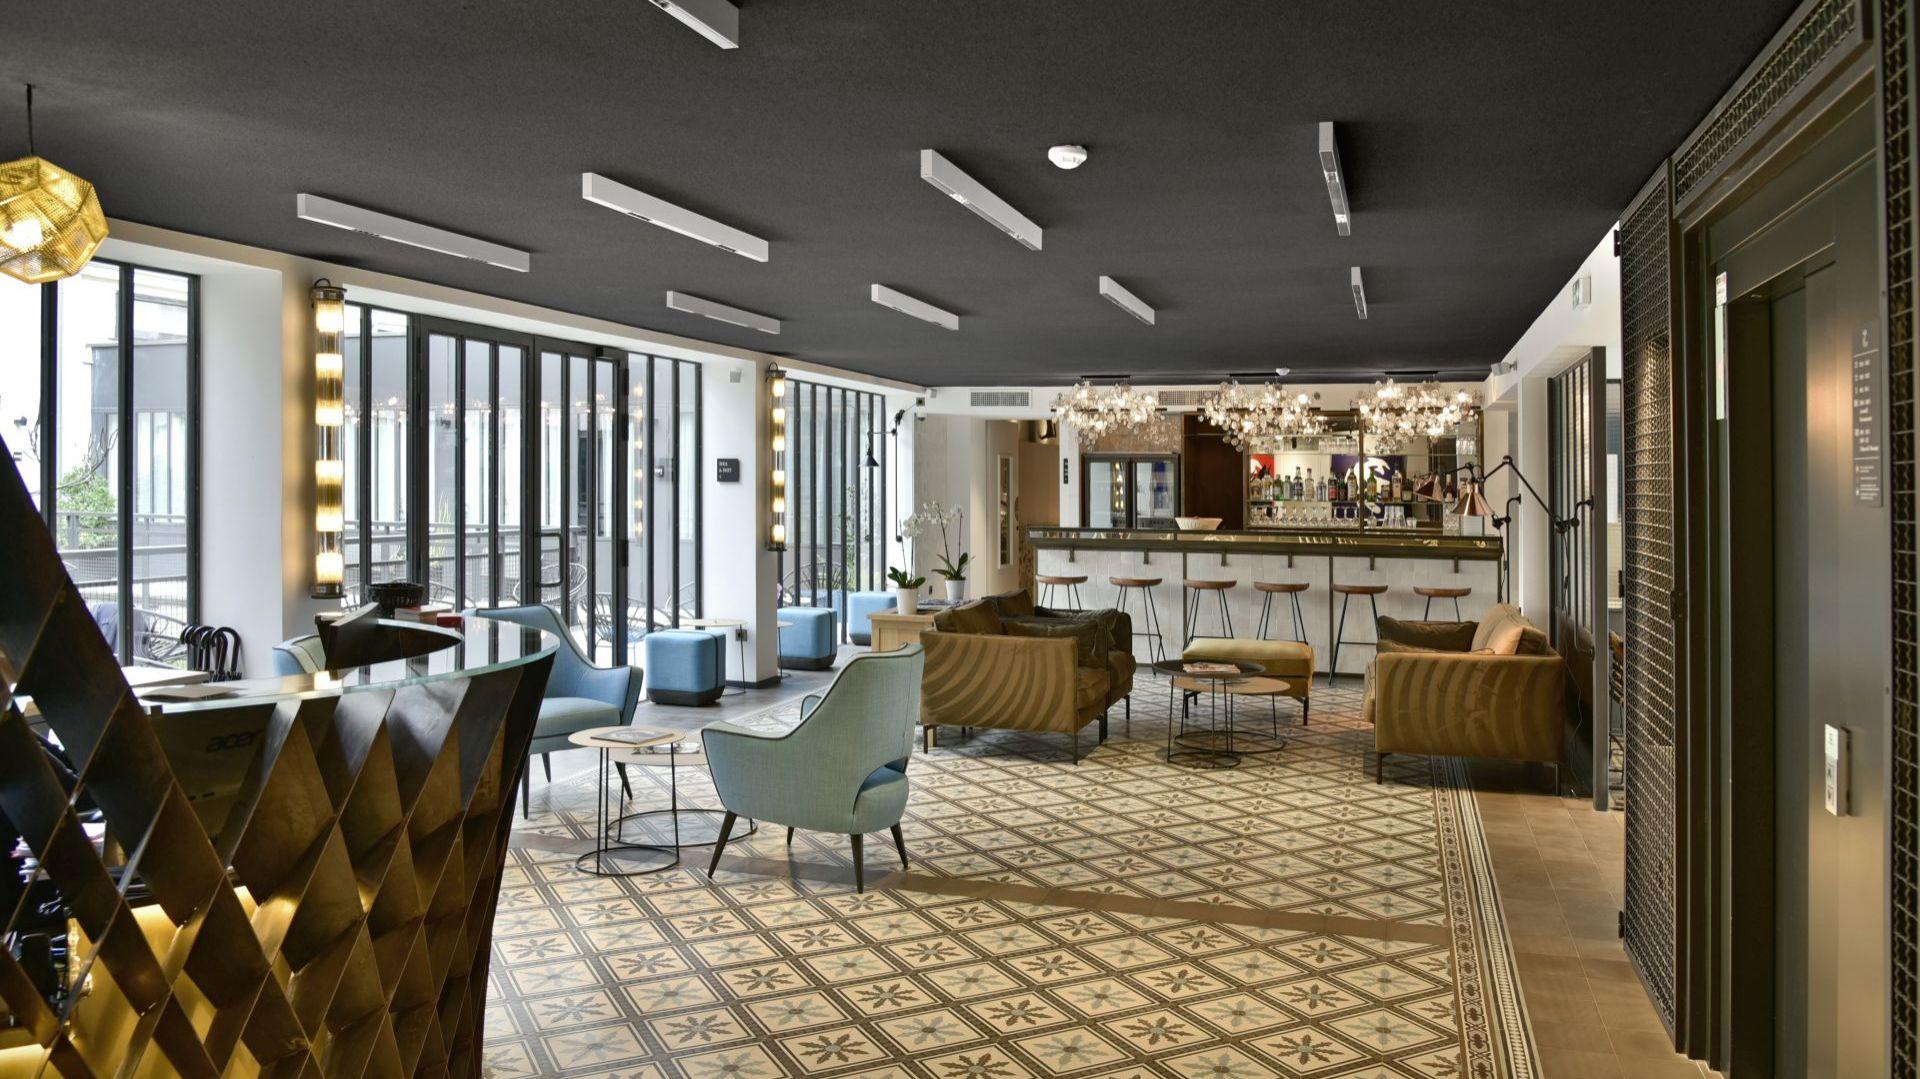 Hotel des deux Girafes i restauracja Bellay, Paryż. Fot.  mat. prasowe Rockfon